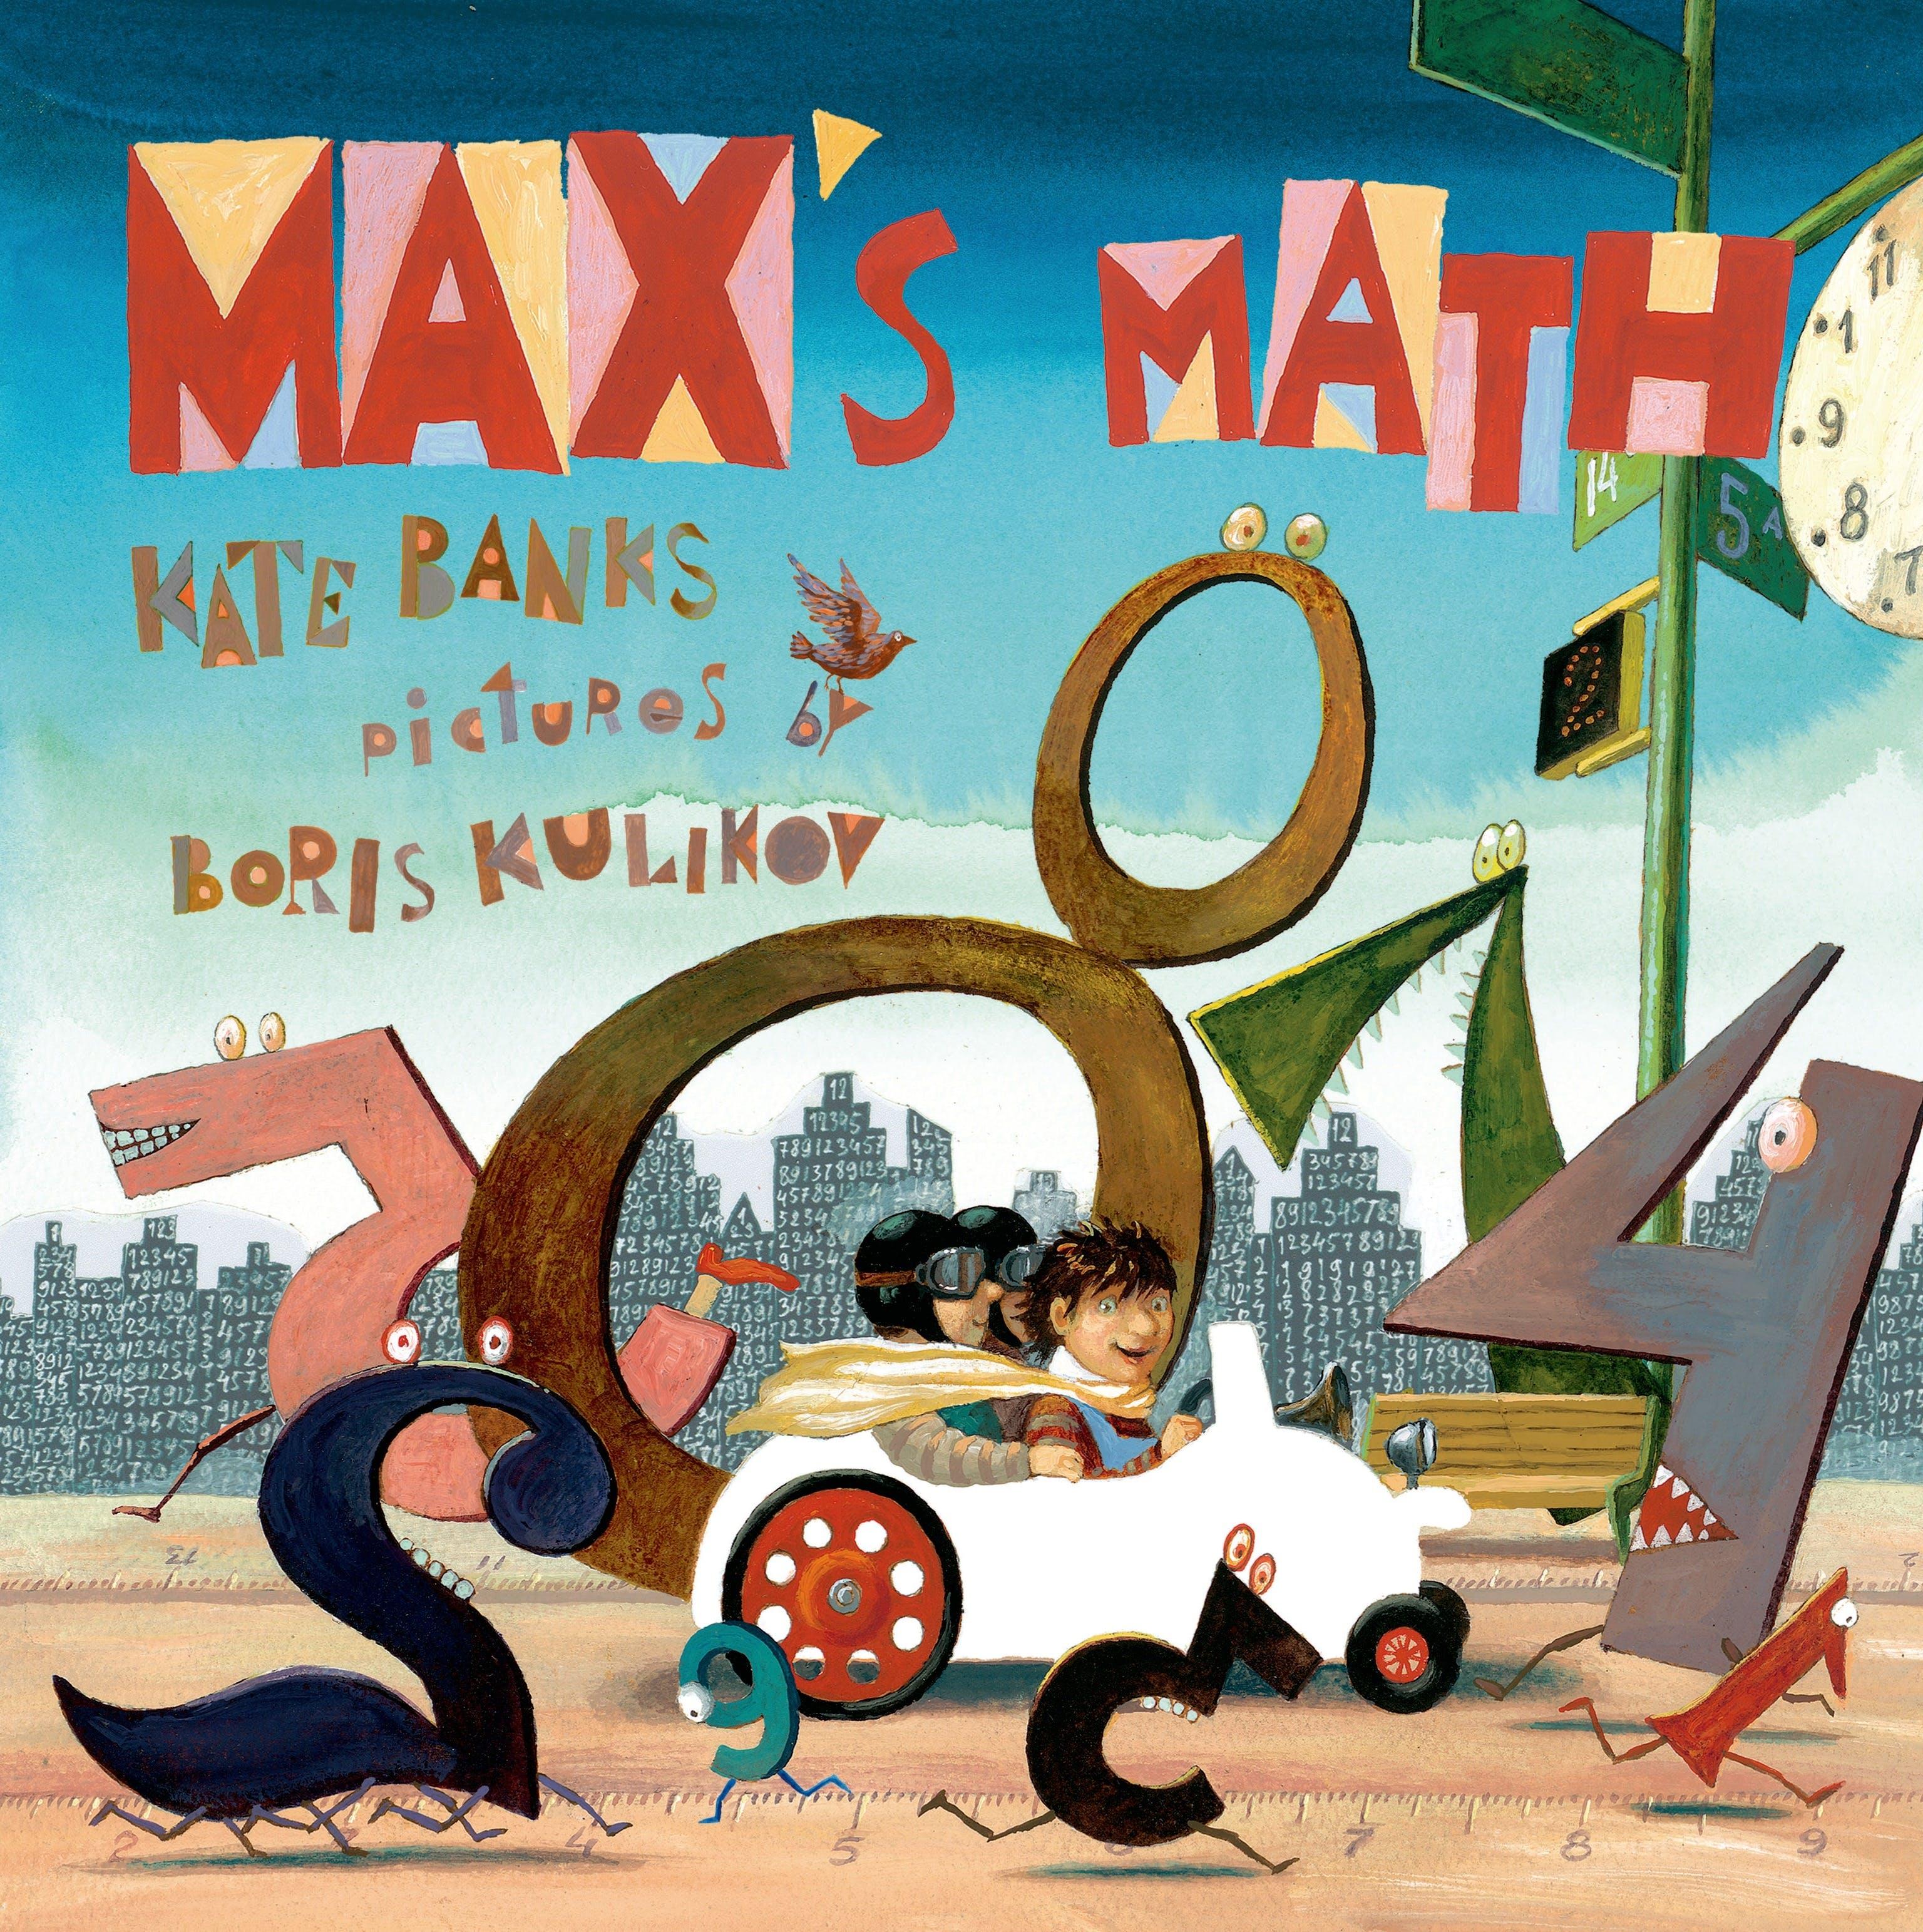 Image of Max's Math